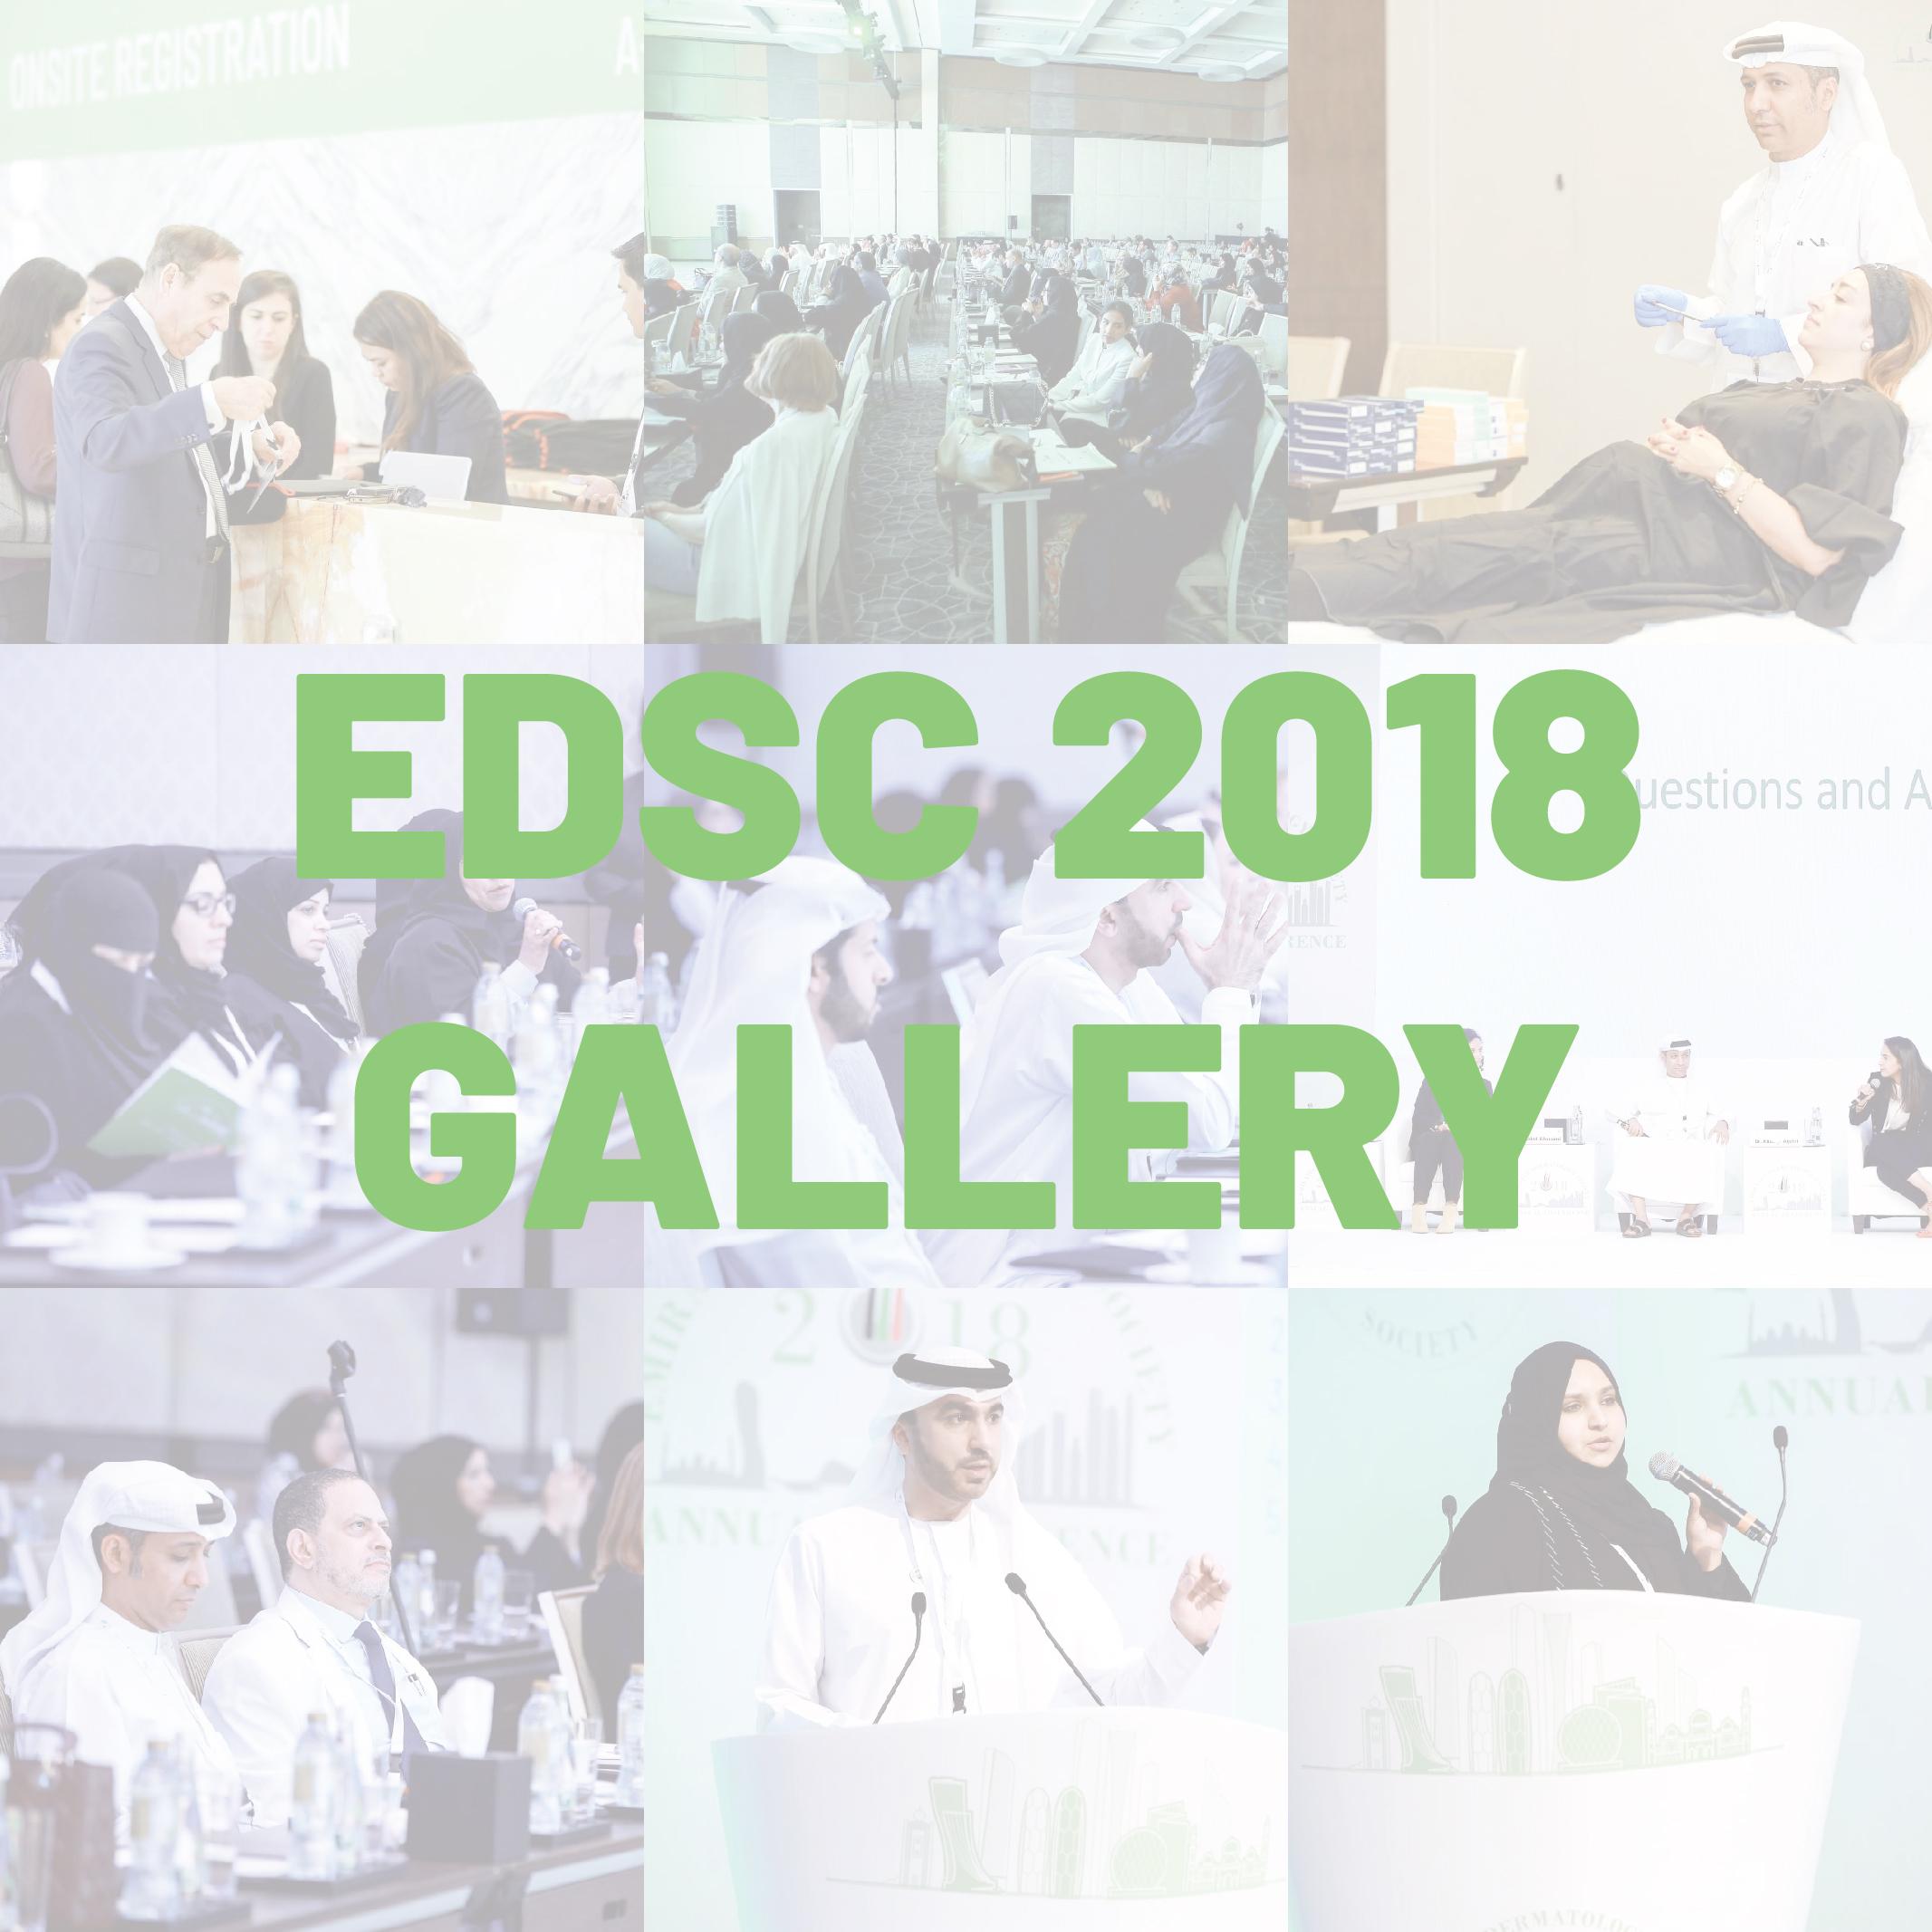 EDSC 2018 GALLERY